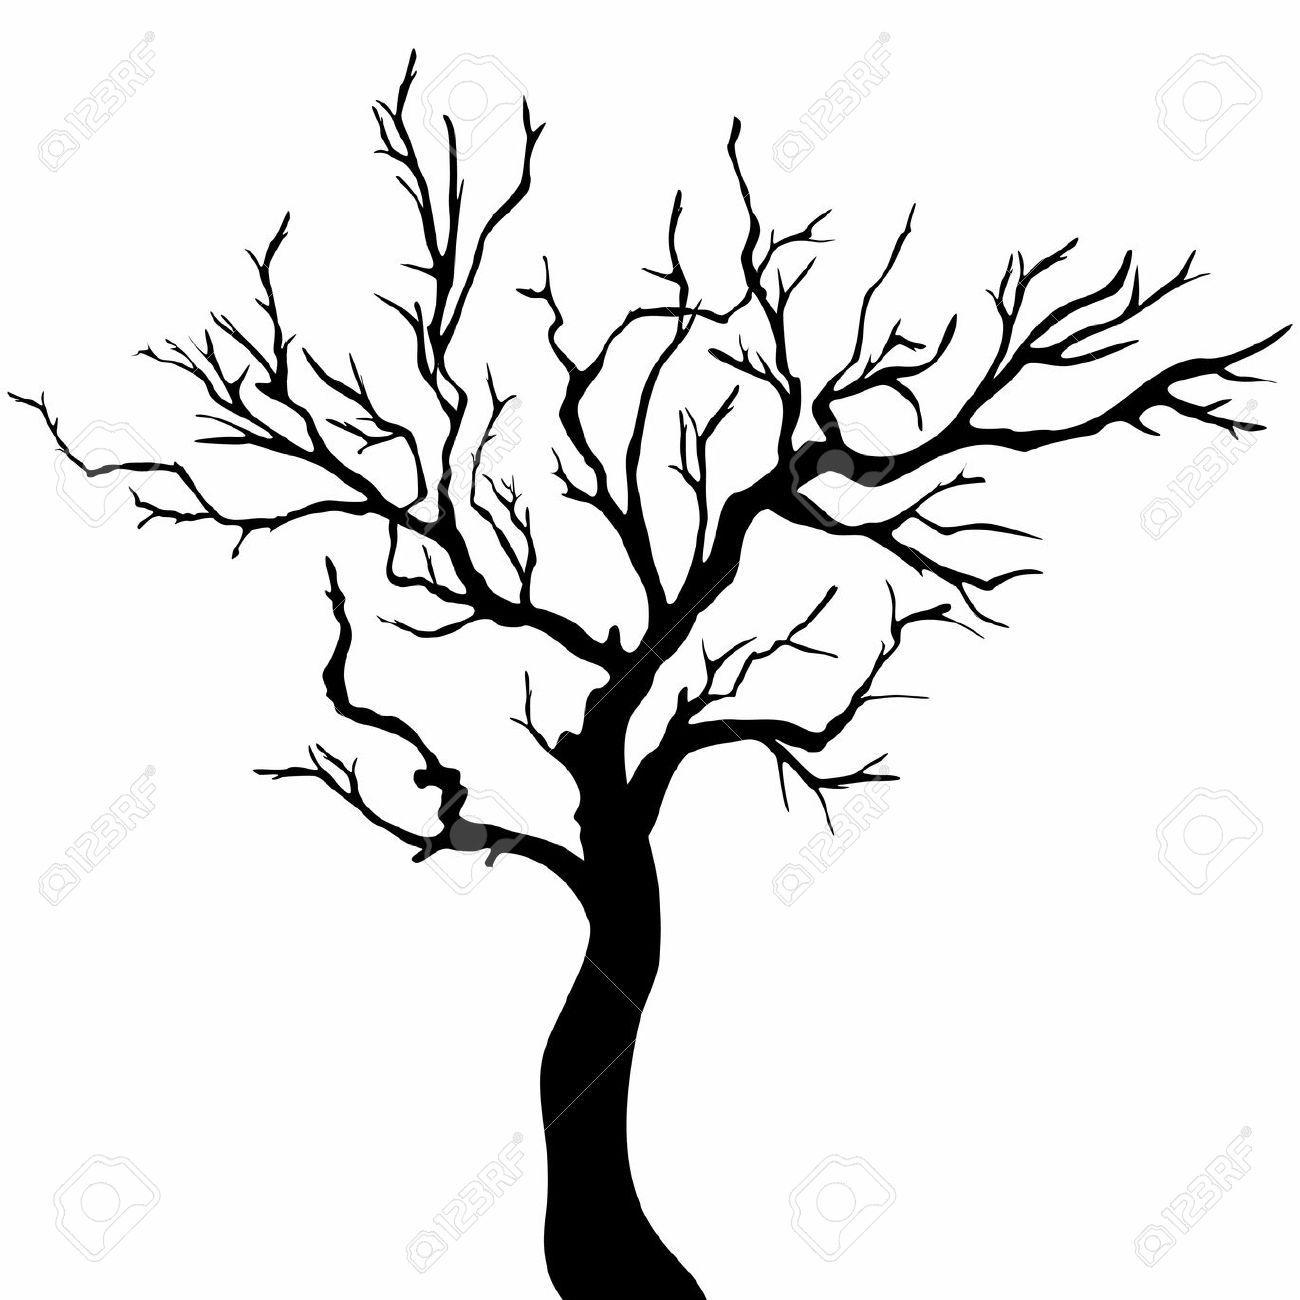 1300x1300 stock vector clip art tree silhouette, tree stencil, tree outline